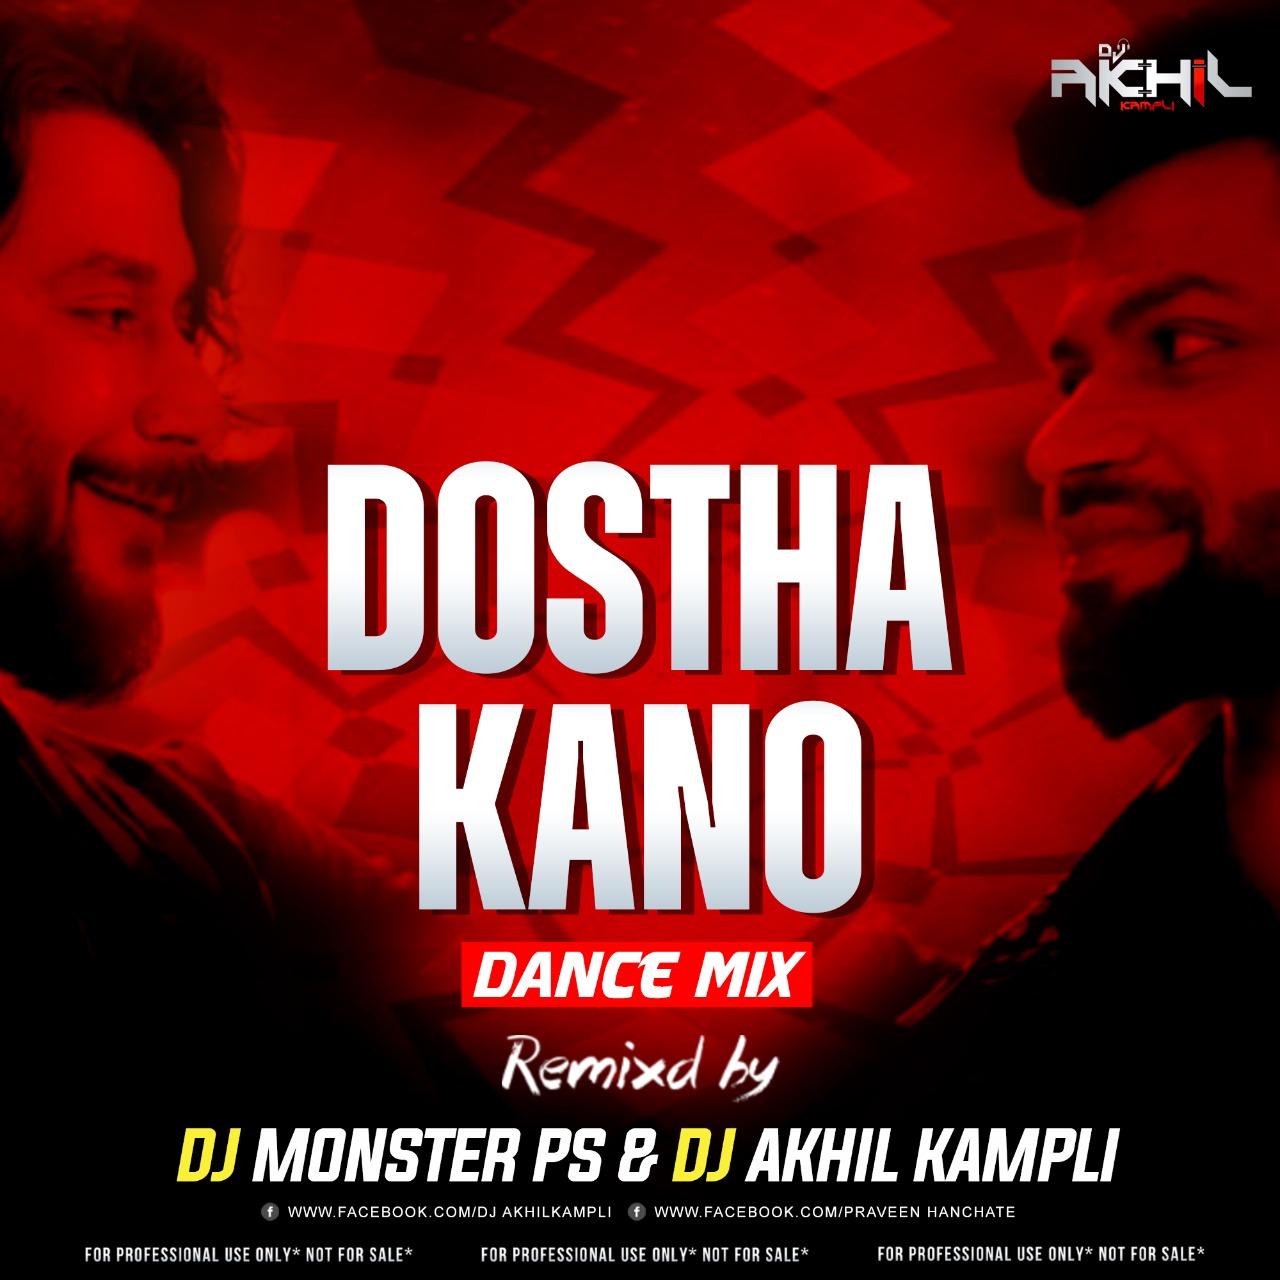 Dostha Kano x Dance Mix x Dj Monster PS Dj Akhil Kampli